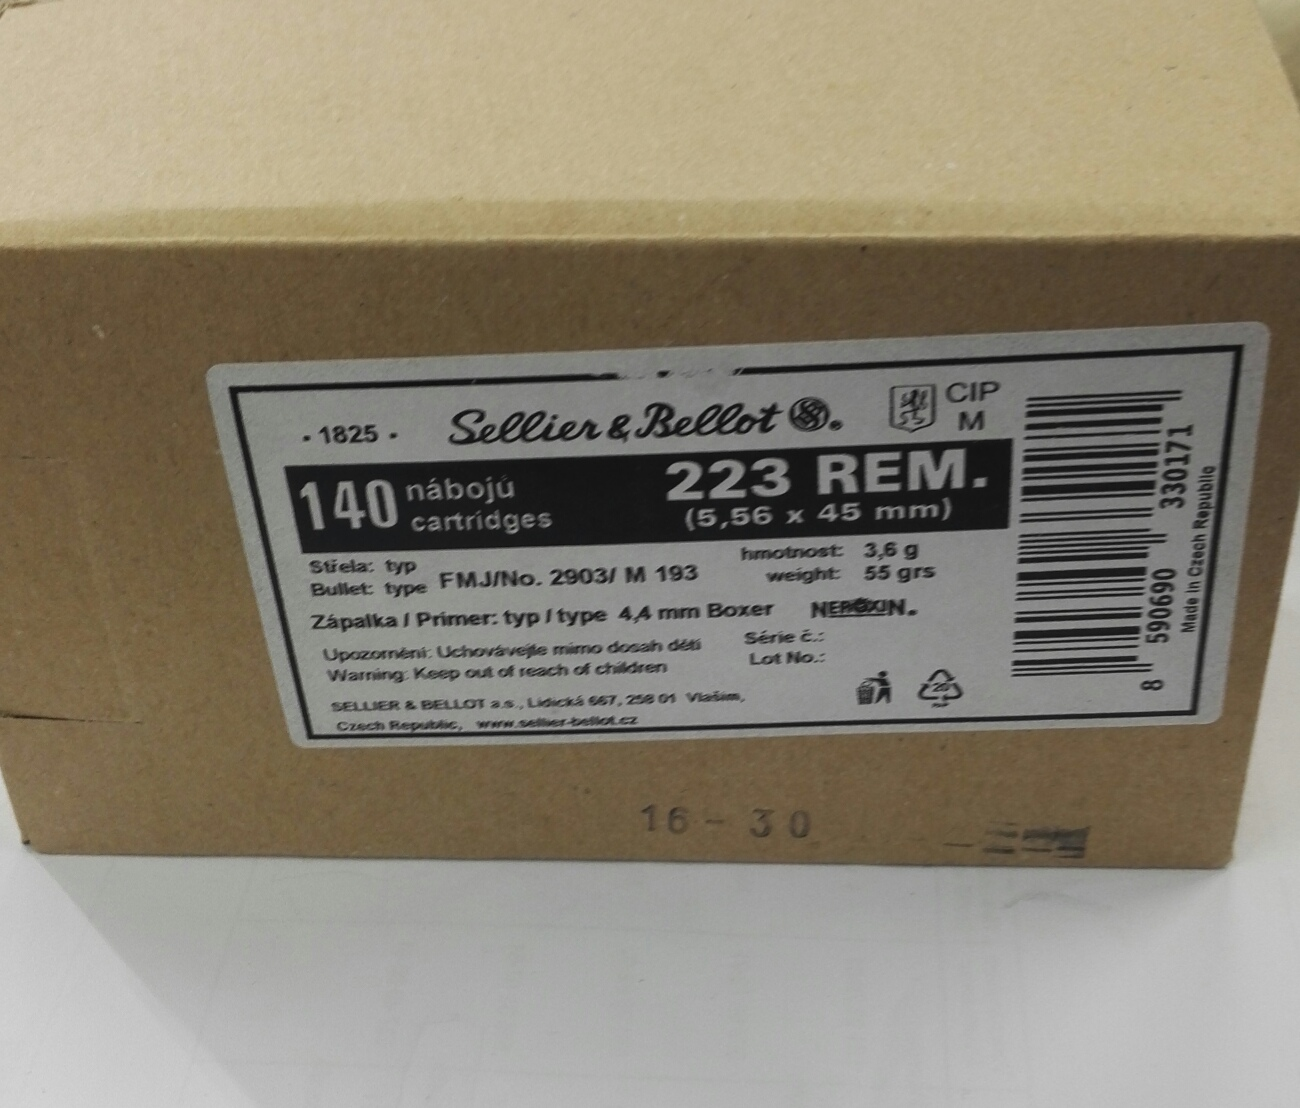 Sellier & Bellot 223 Rem 5.56x45 3,6 g / 55 gr 140 kpl / ltk